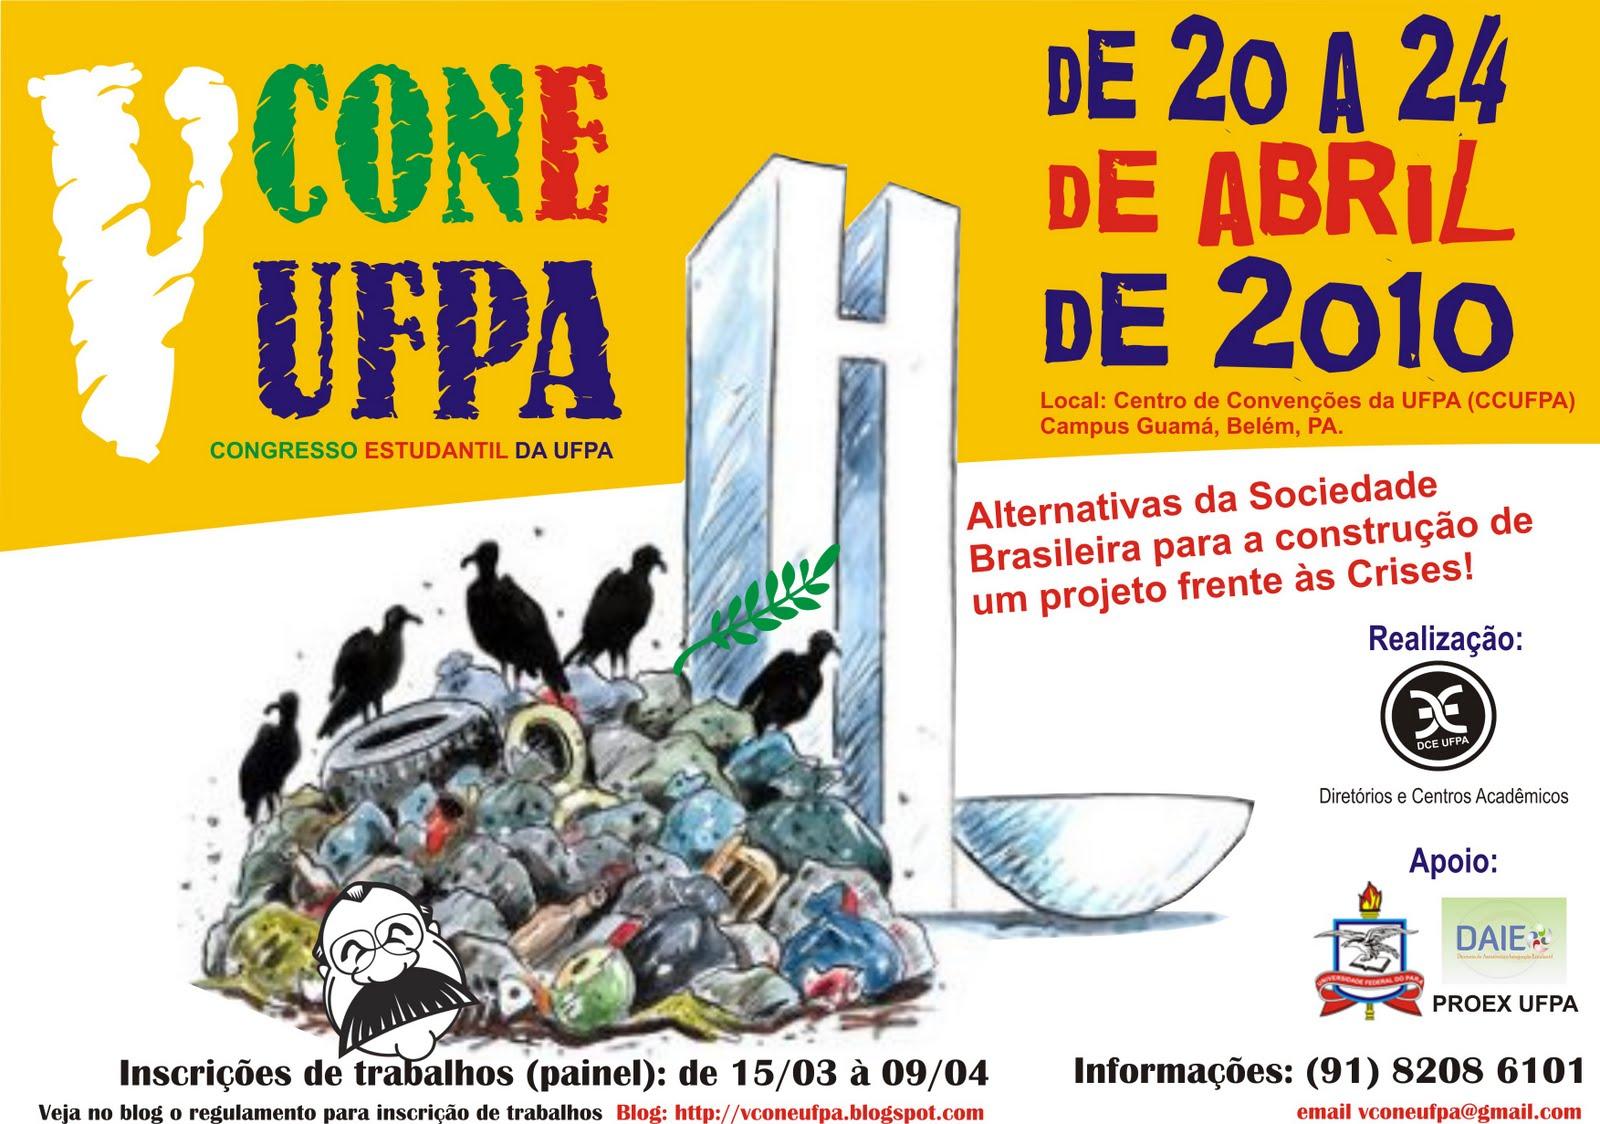 V Congresso Estudantil da UFPA (CONEUFPA)